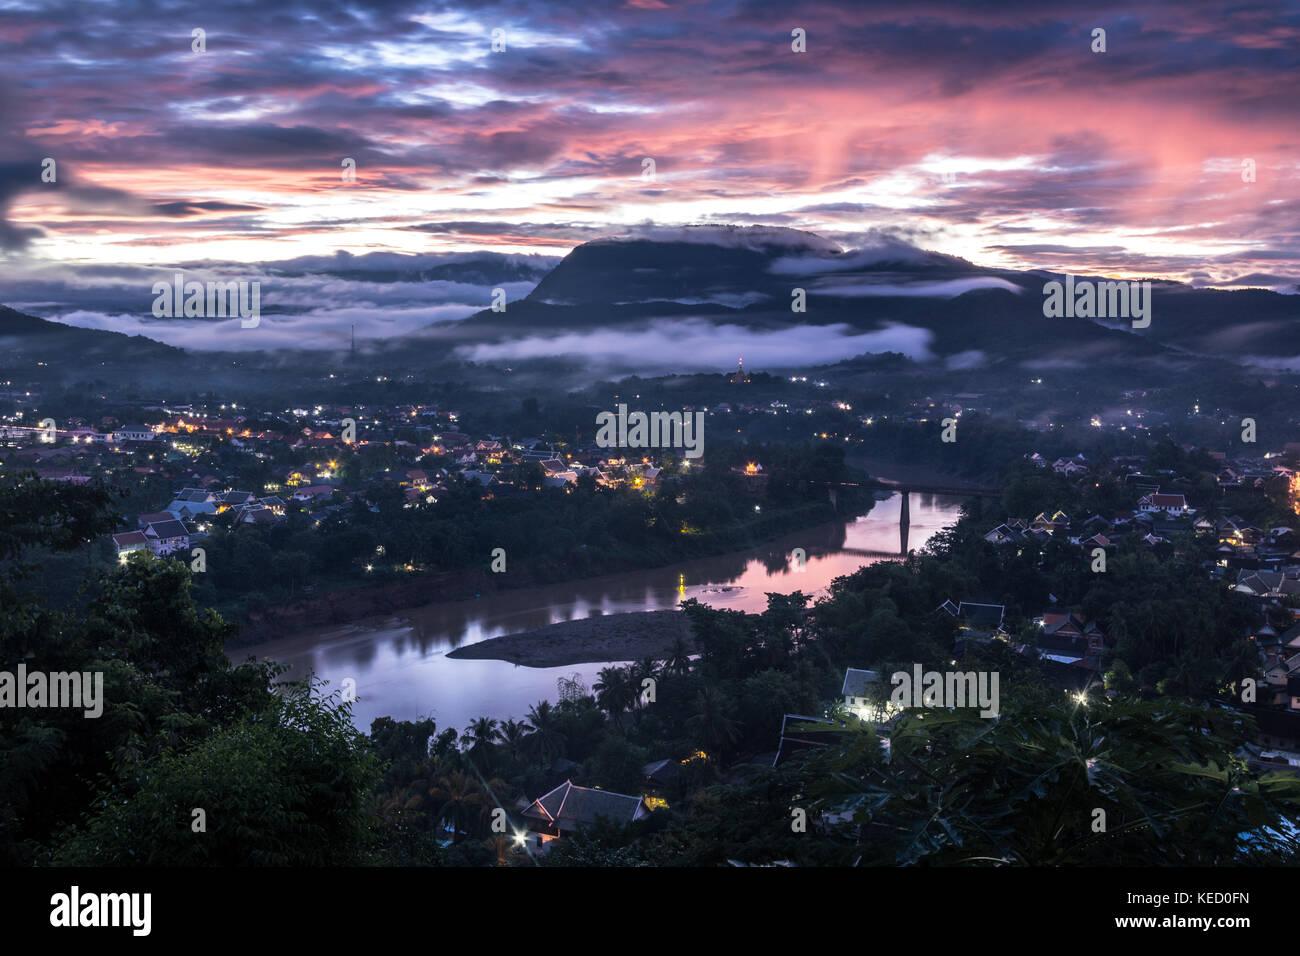 Sun beginning to rise over Luang Prabang, Northern Laos. Stock Photo